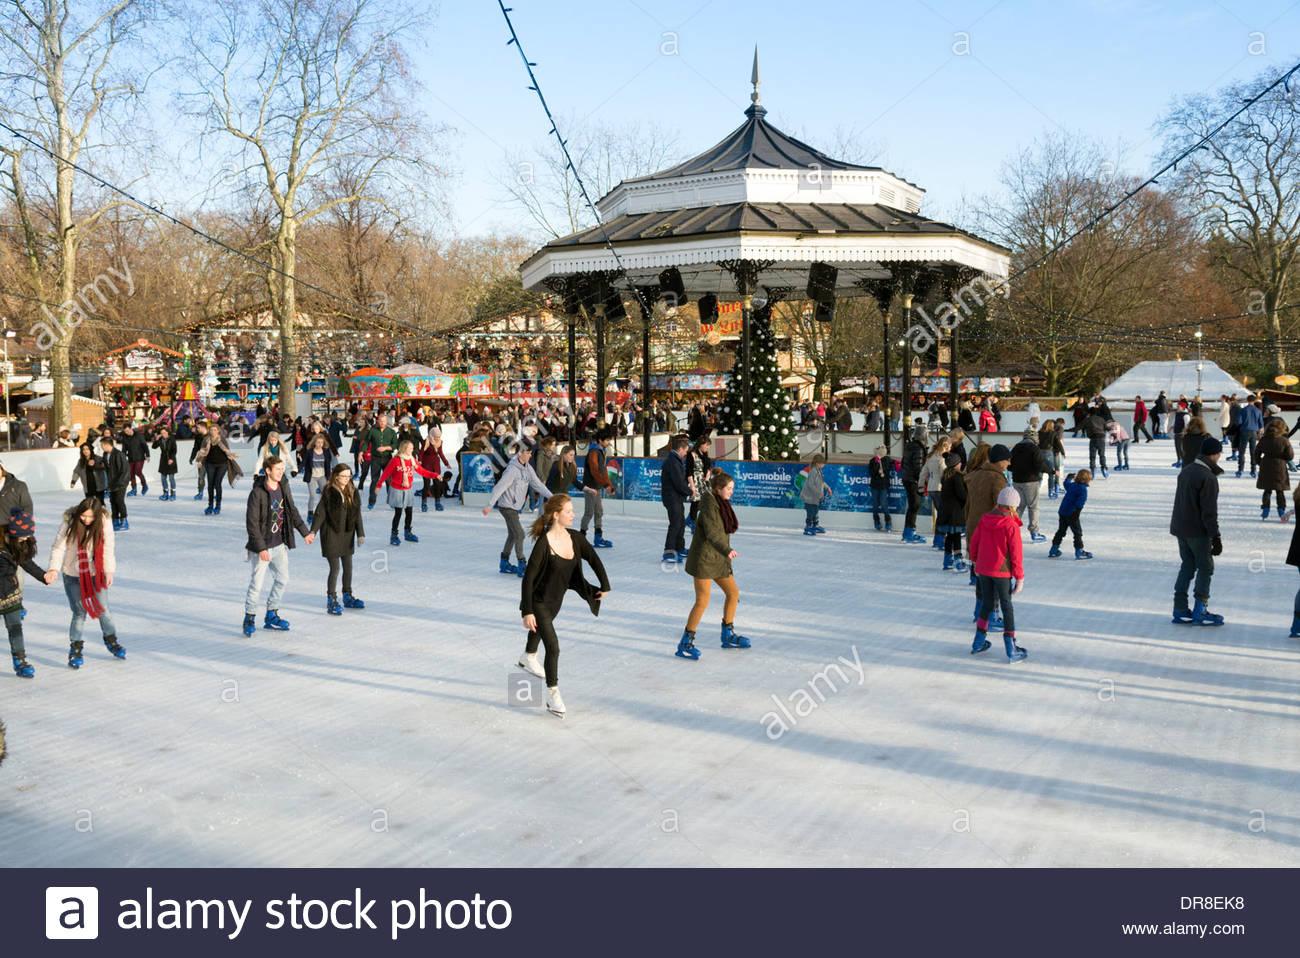 Open Air Eislaufbahn An Weihnachten Im Winter Wunderland